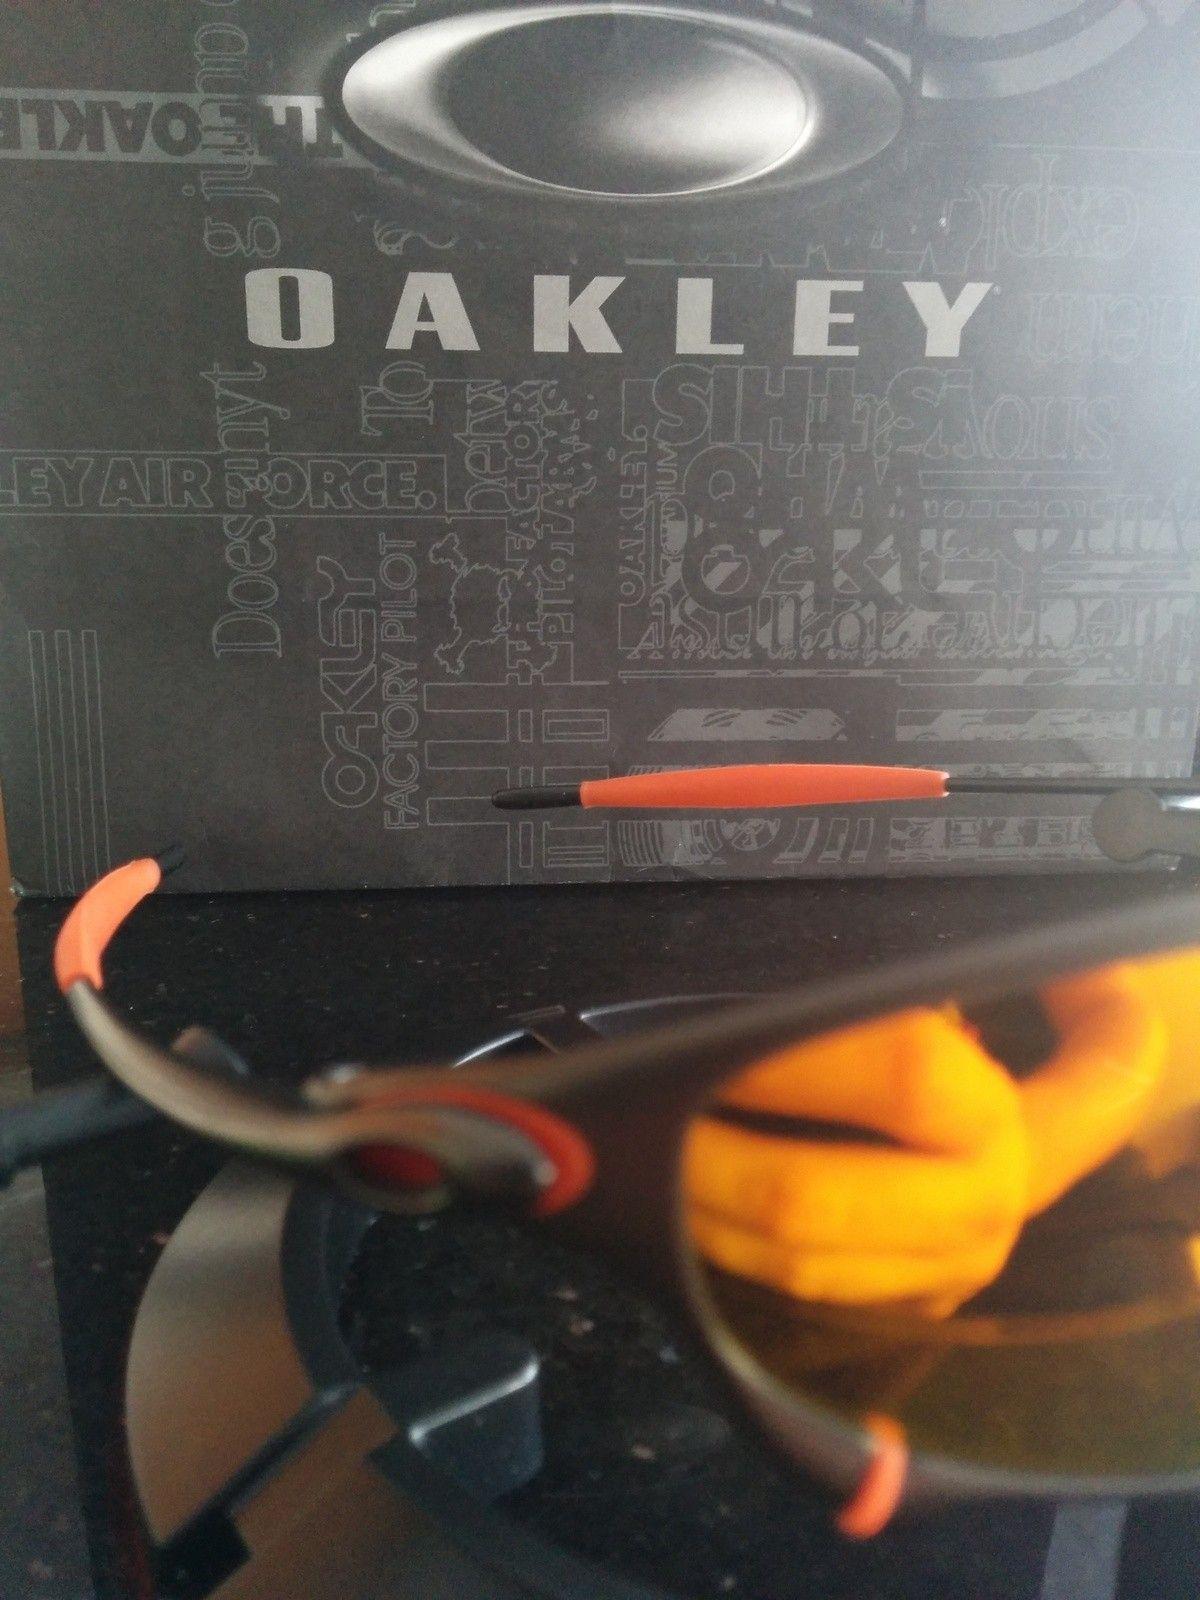 Pic request :Carbon Juliet/Fire lens with Linegear Orange rubber - uploadfromtaptalk1422984237977.jpg